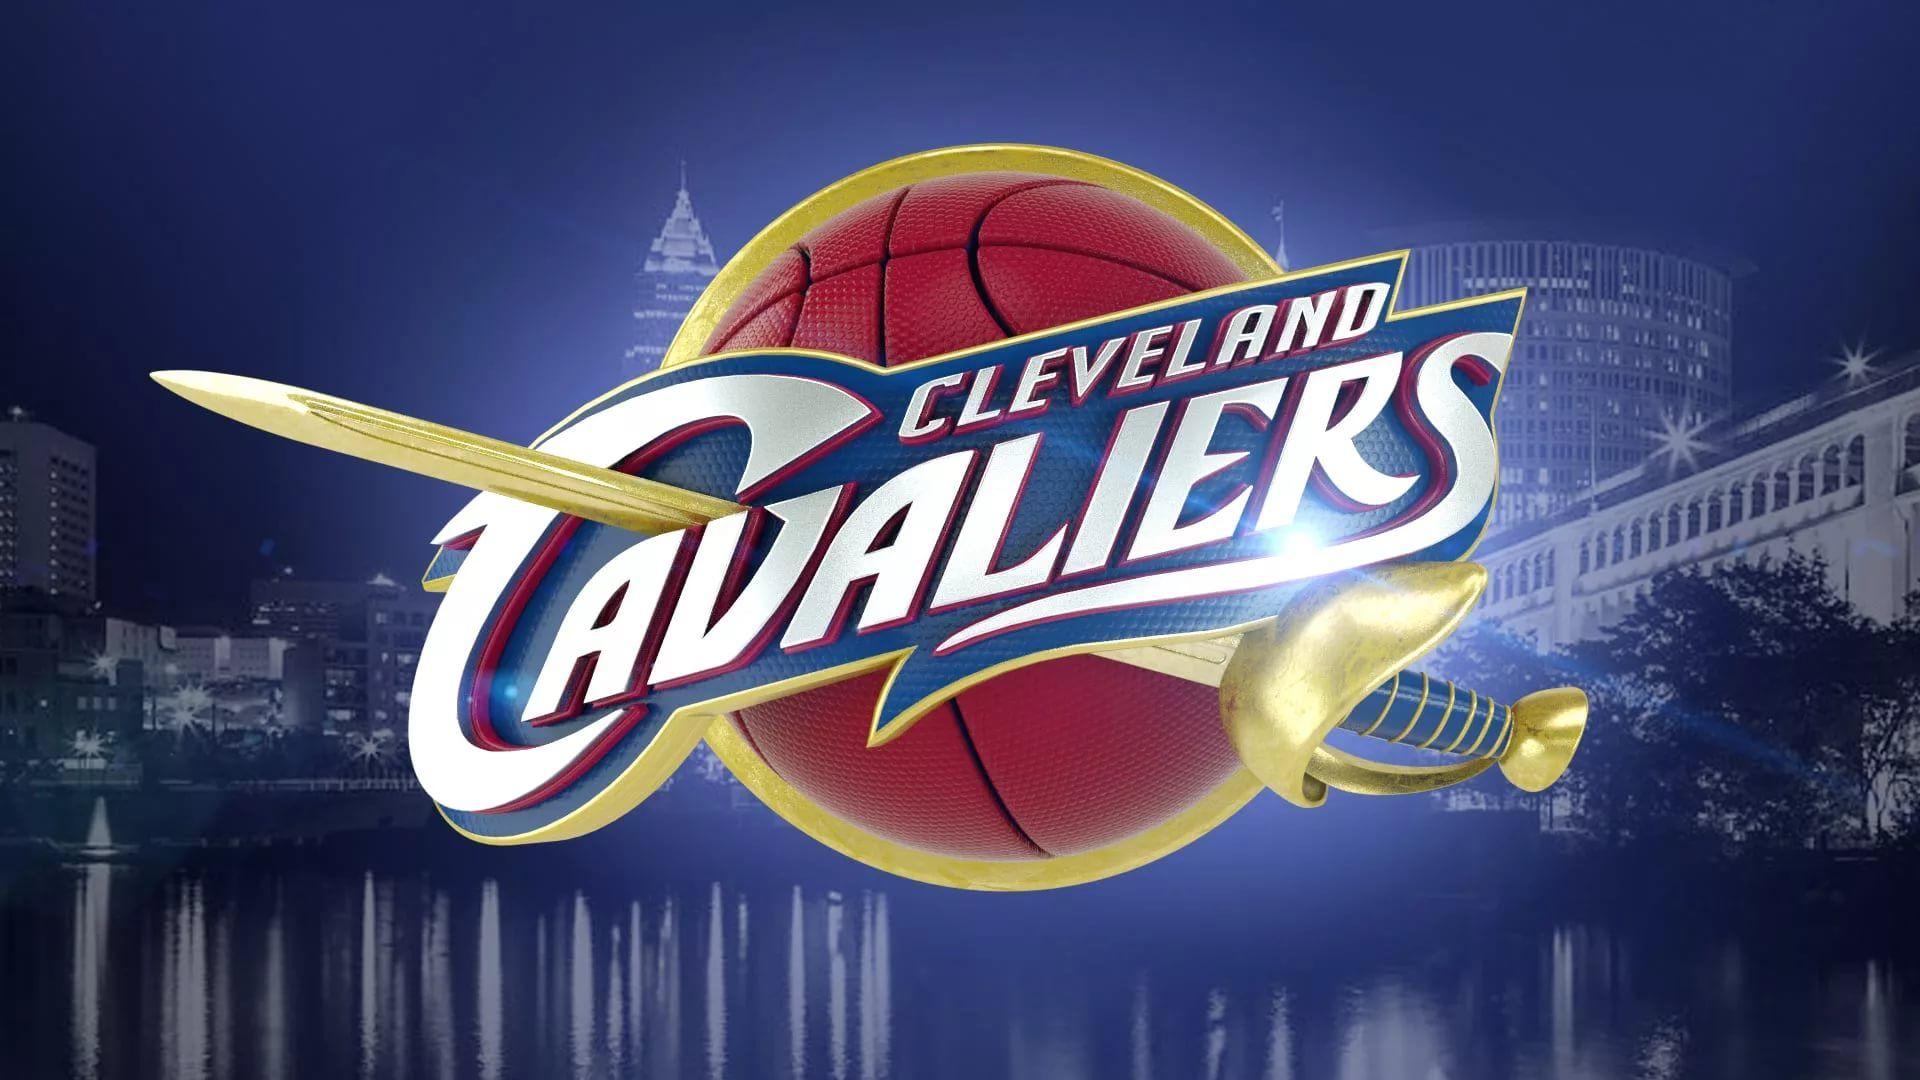 Cleveland pc wallpaper